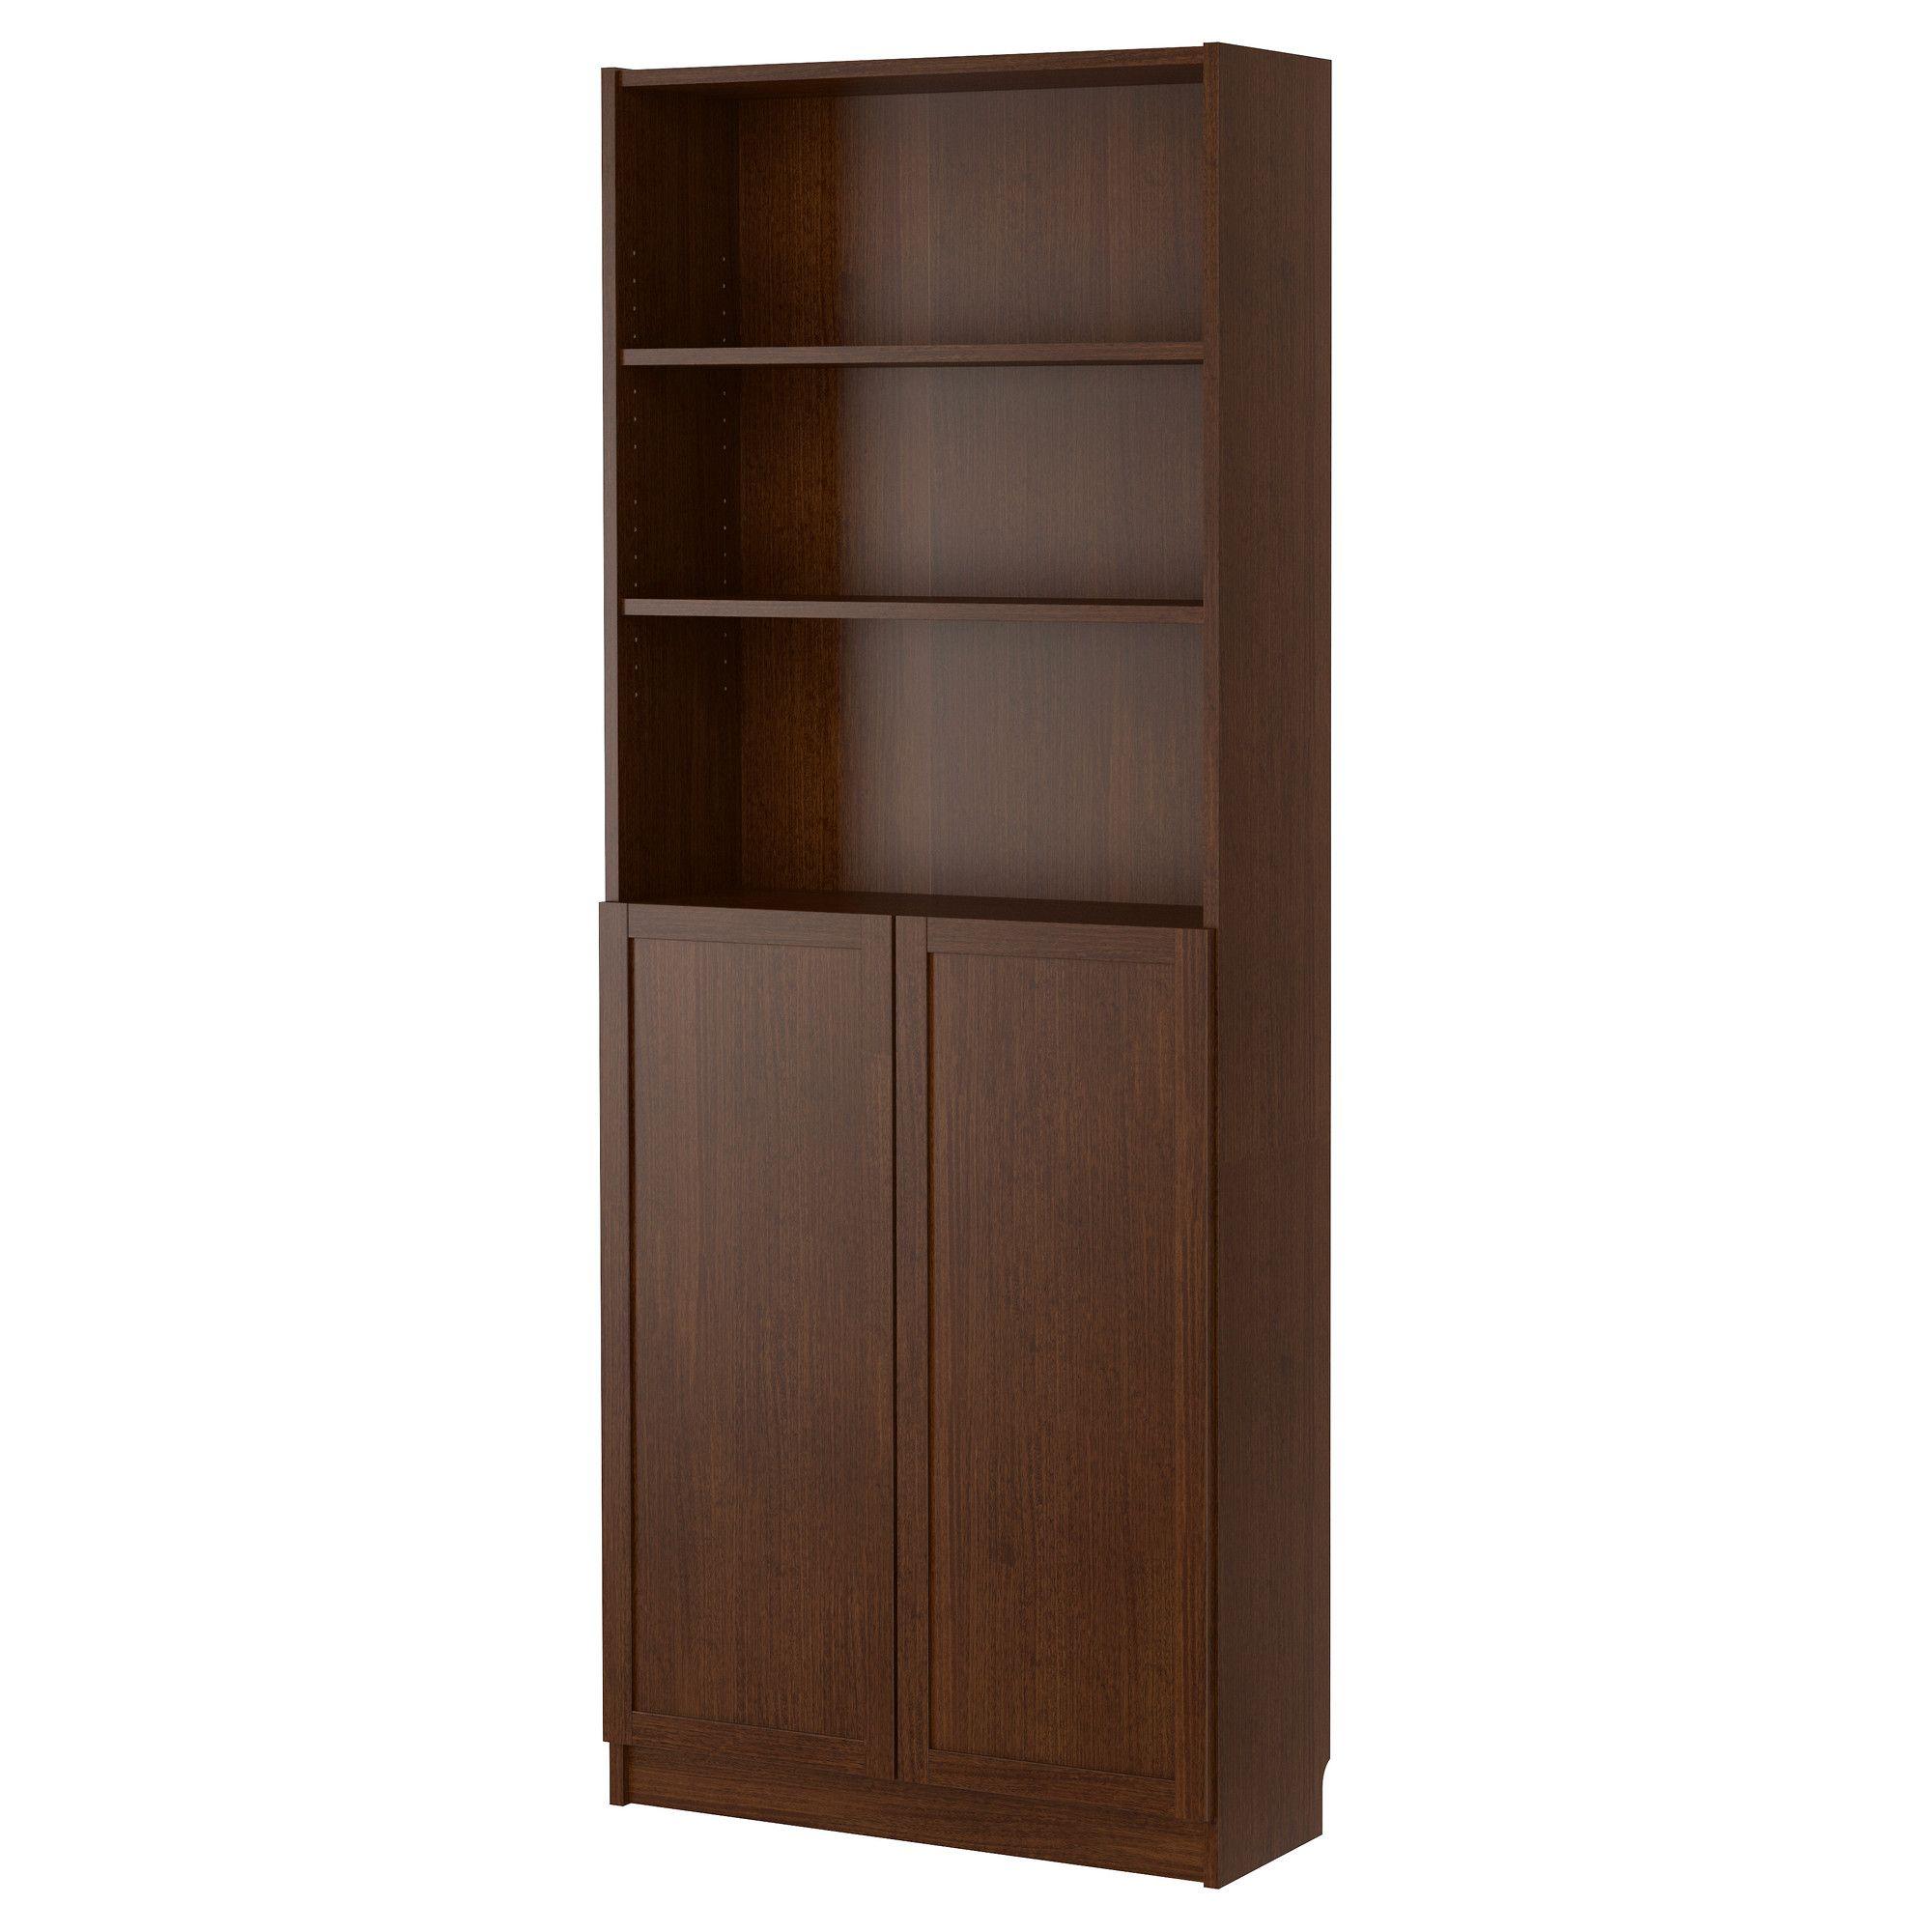 billy bookcase with doors - medium brown - ikea | articles pour la, Gestaltungsideen